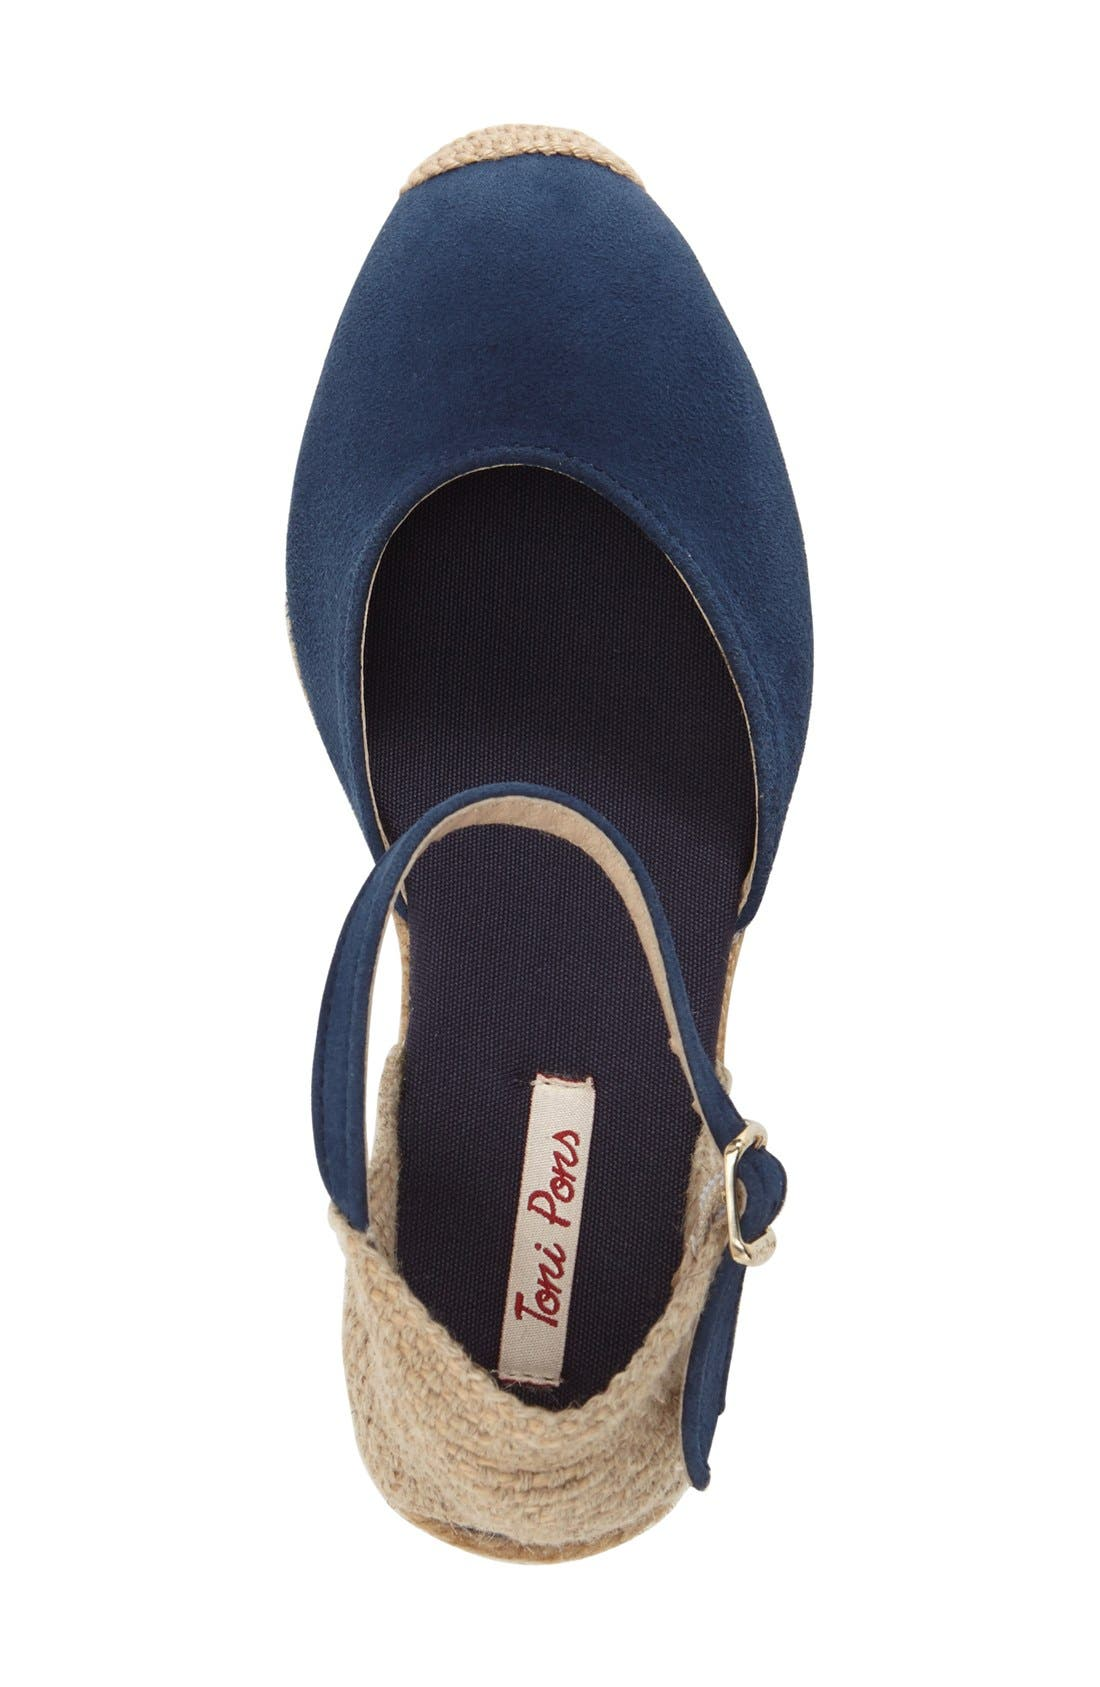 TONI PONS, 'Lloret-5' Espadrille Wedge Sandal, Alternate thumbnail 3, color, NAVY SUEDE